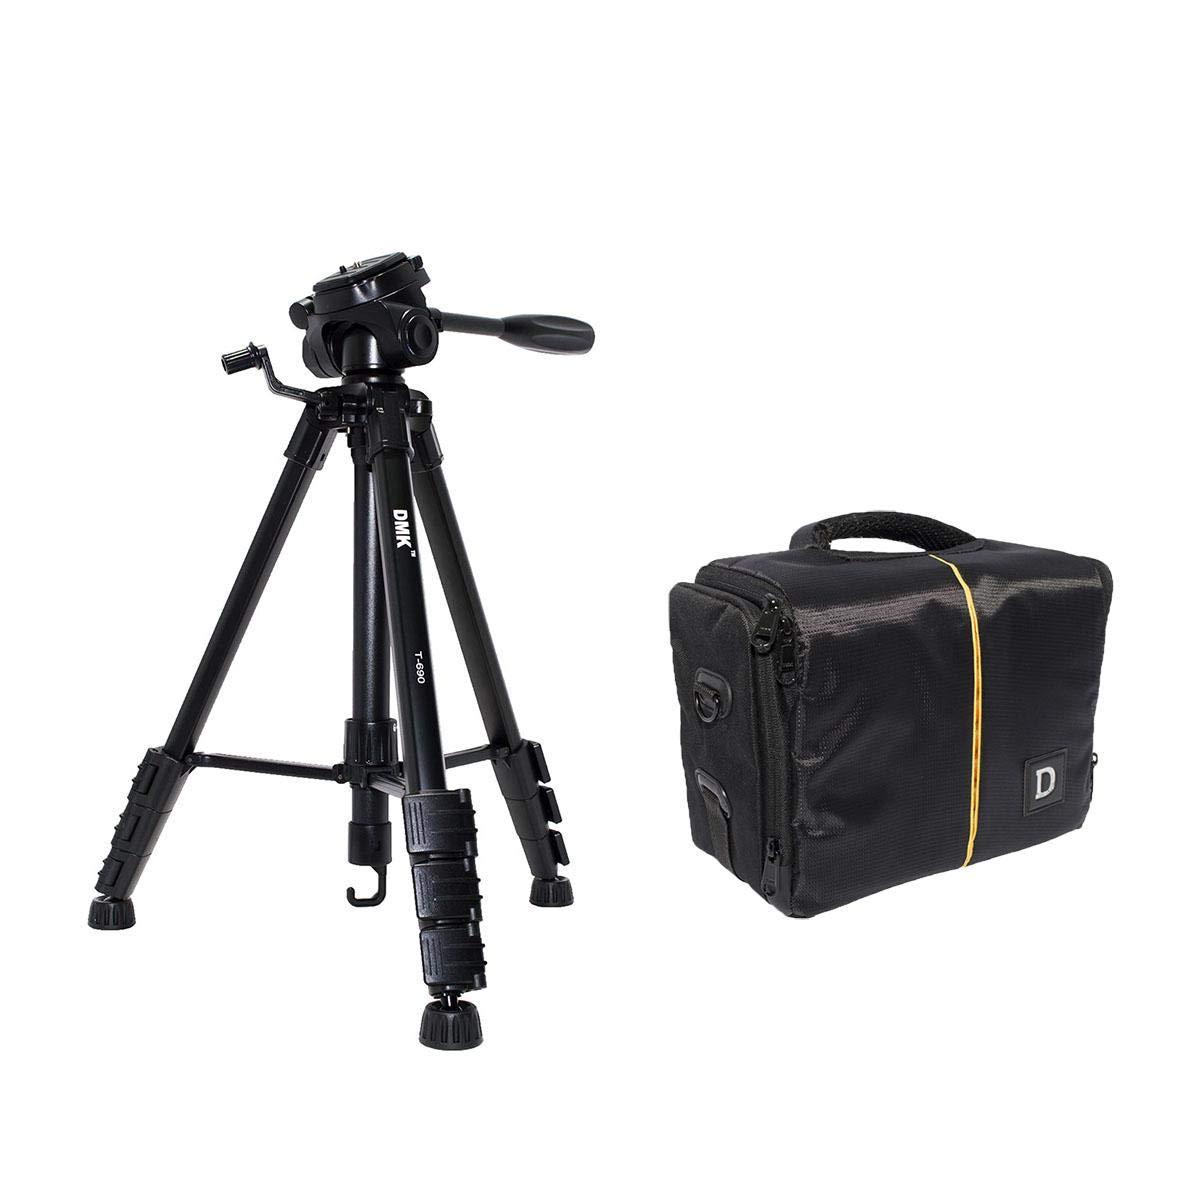 DMK POWER T690 Tripod + BL-25 D Camera bag for Nikon D600, D3100 D3200  D5100 D5200 D5300 D7100 D7200 DSLR Cameras etc